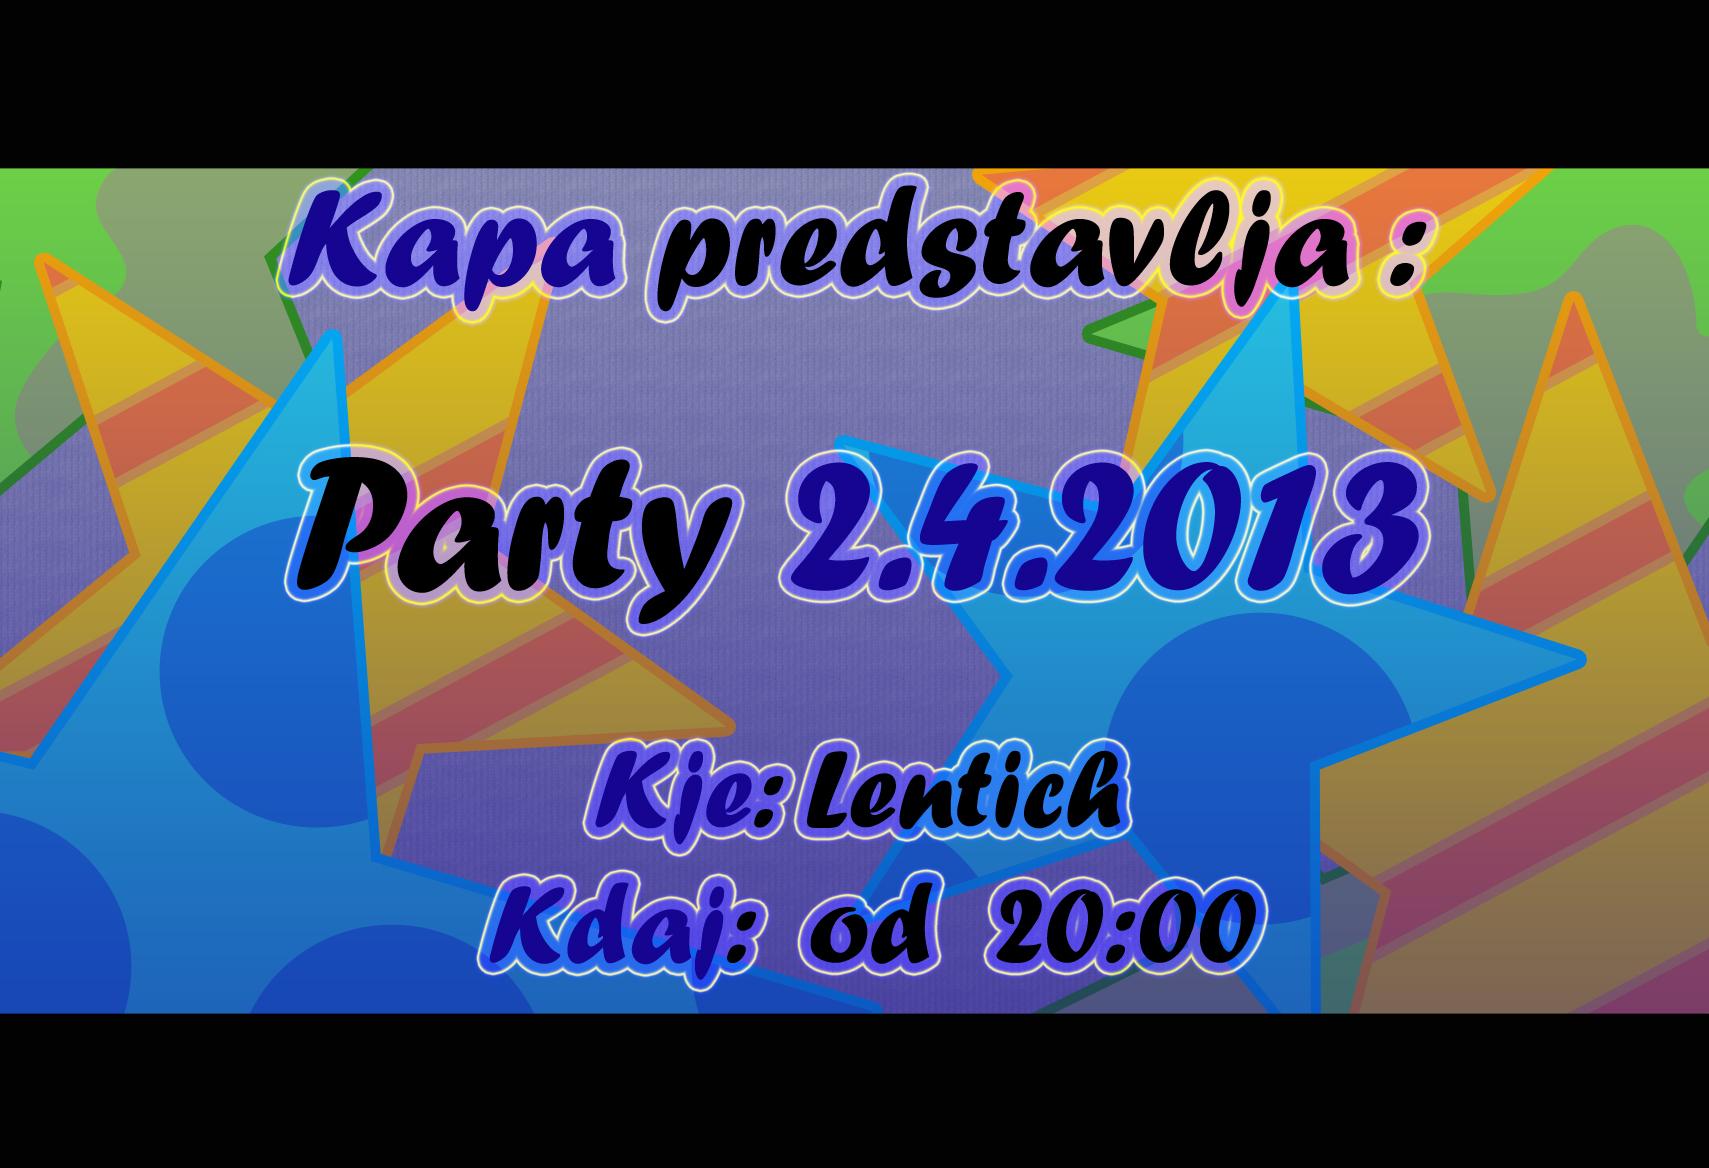 Party by Kapa